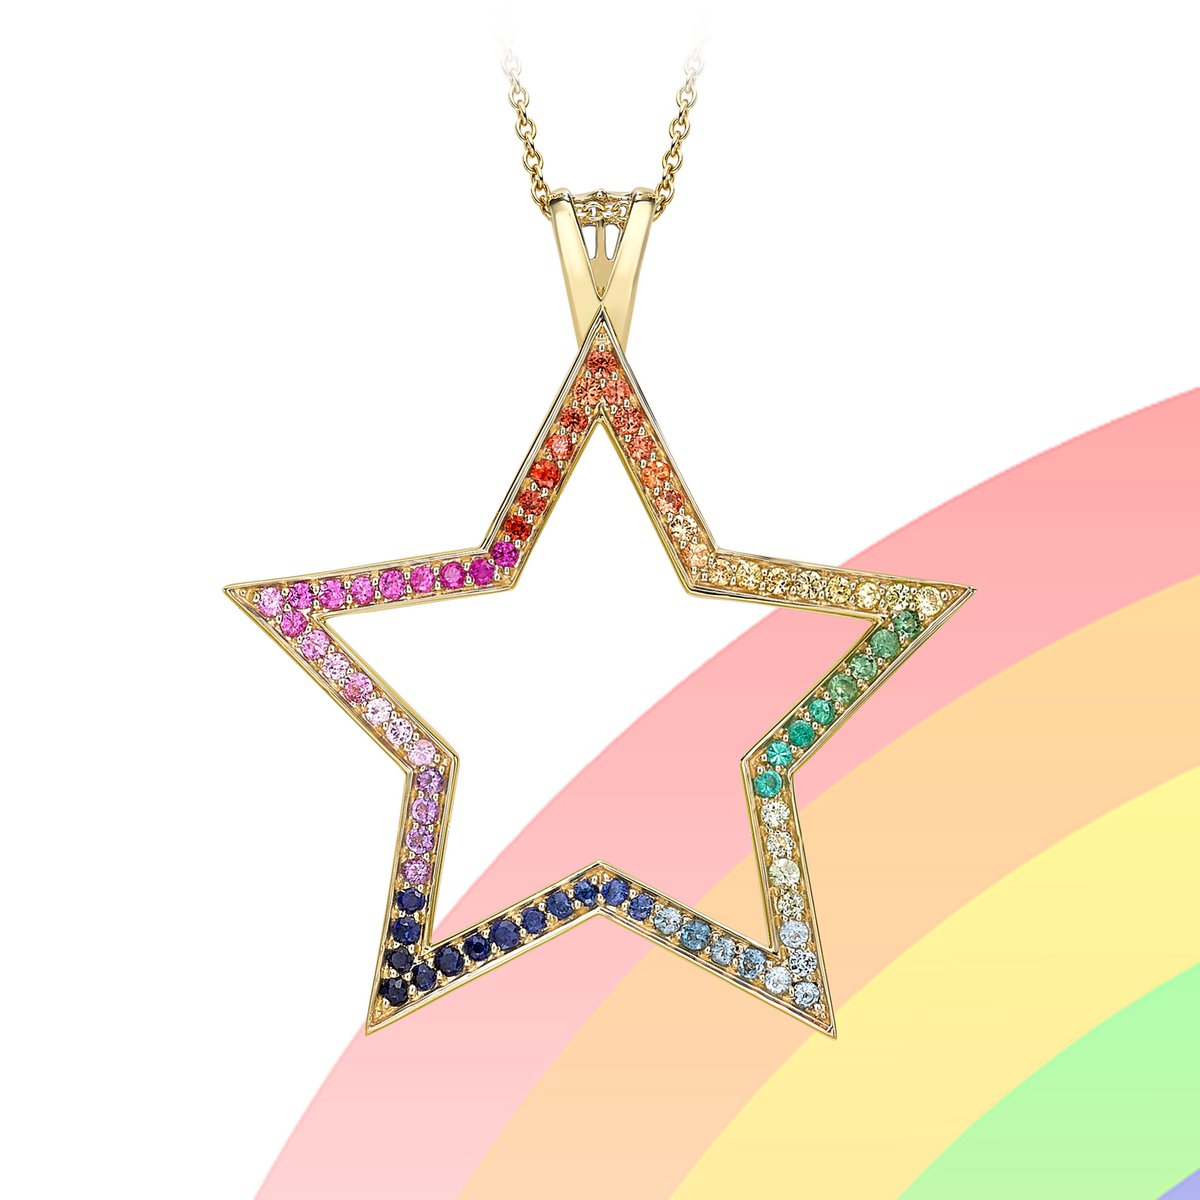 When it rains look for rainbows  When it's dark look for stars  #TheoFennell #Star #Rainbow #Pendant #Sapphire #Topaz #Emerald #Tsavorite #Garnet #Peridot #Amethyst #Rubypic.twitter.com/dV5mjuXiFD